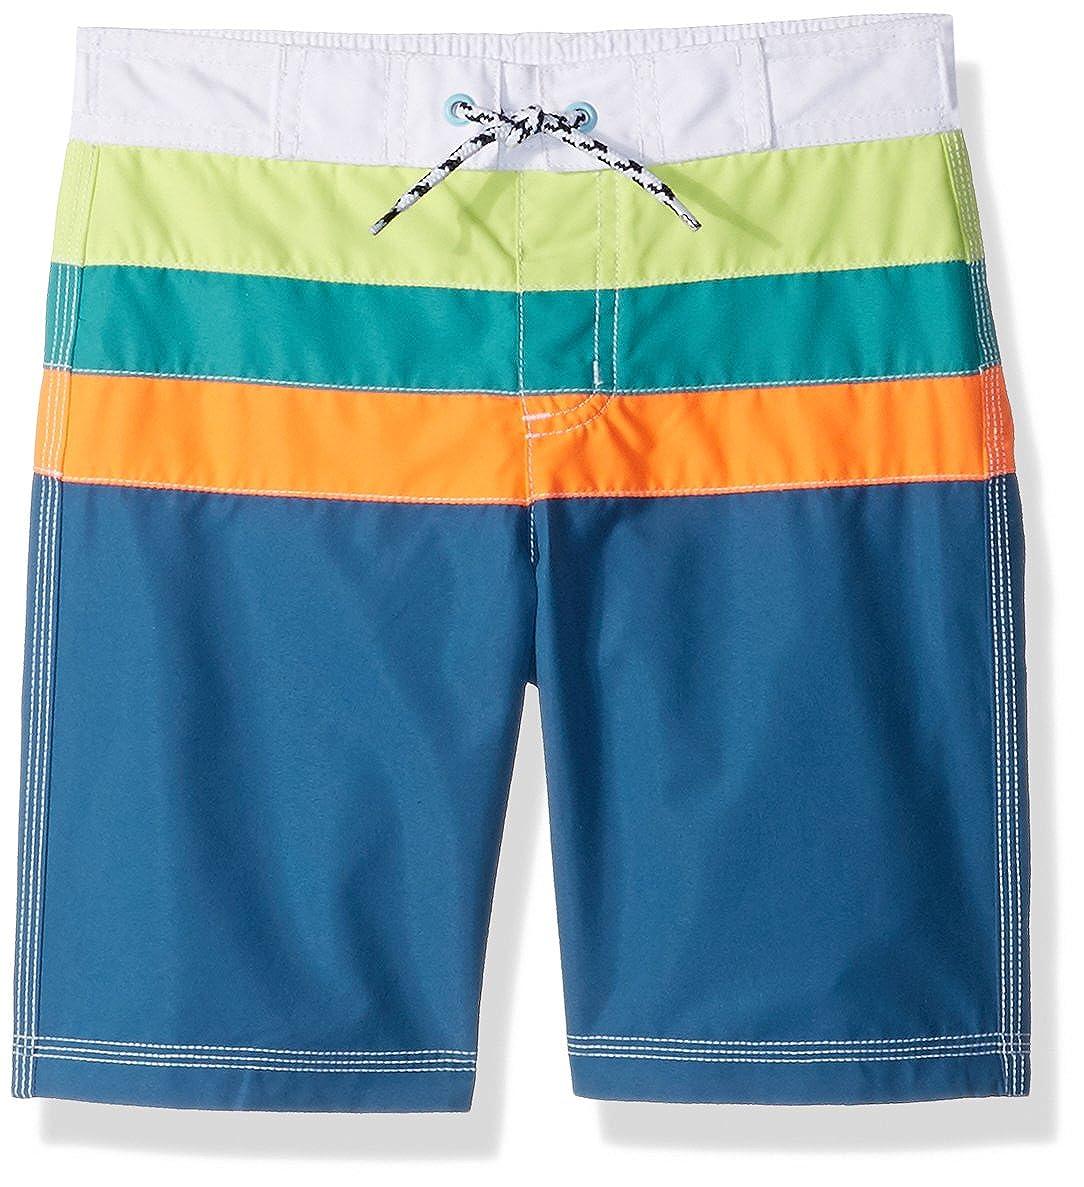 Gymboree Toddler Boys' Colorblock Swim Trunks Pool Blue 12-18 Mo 241821797